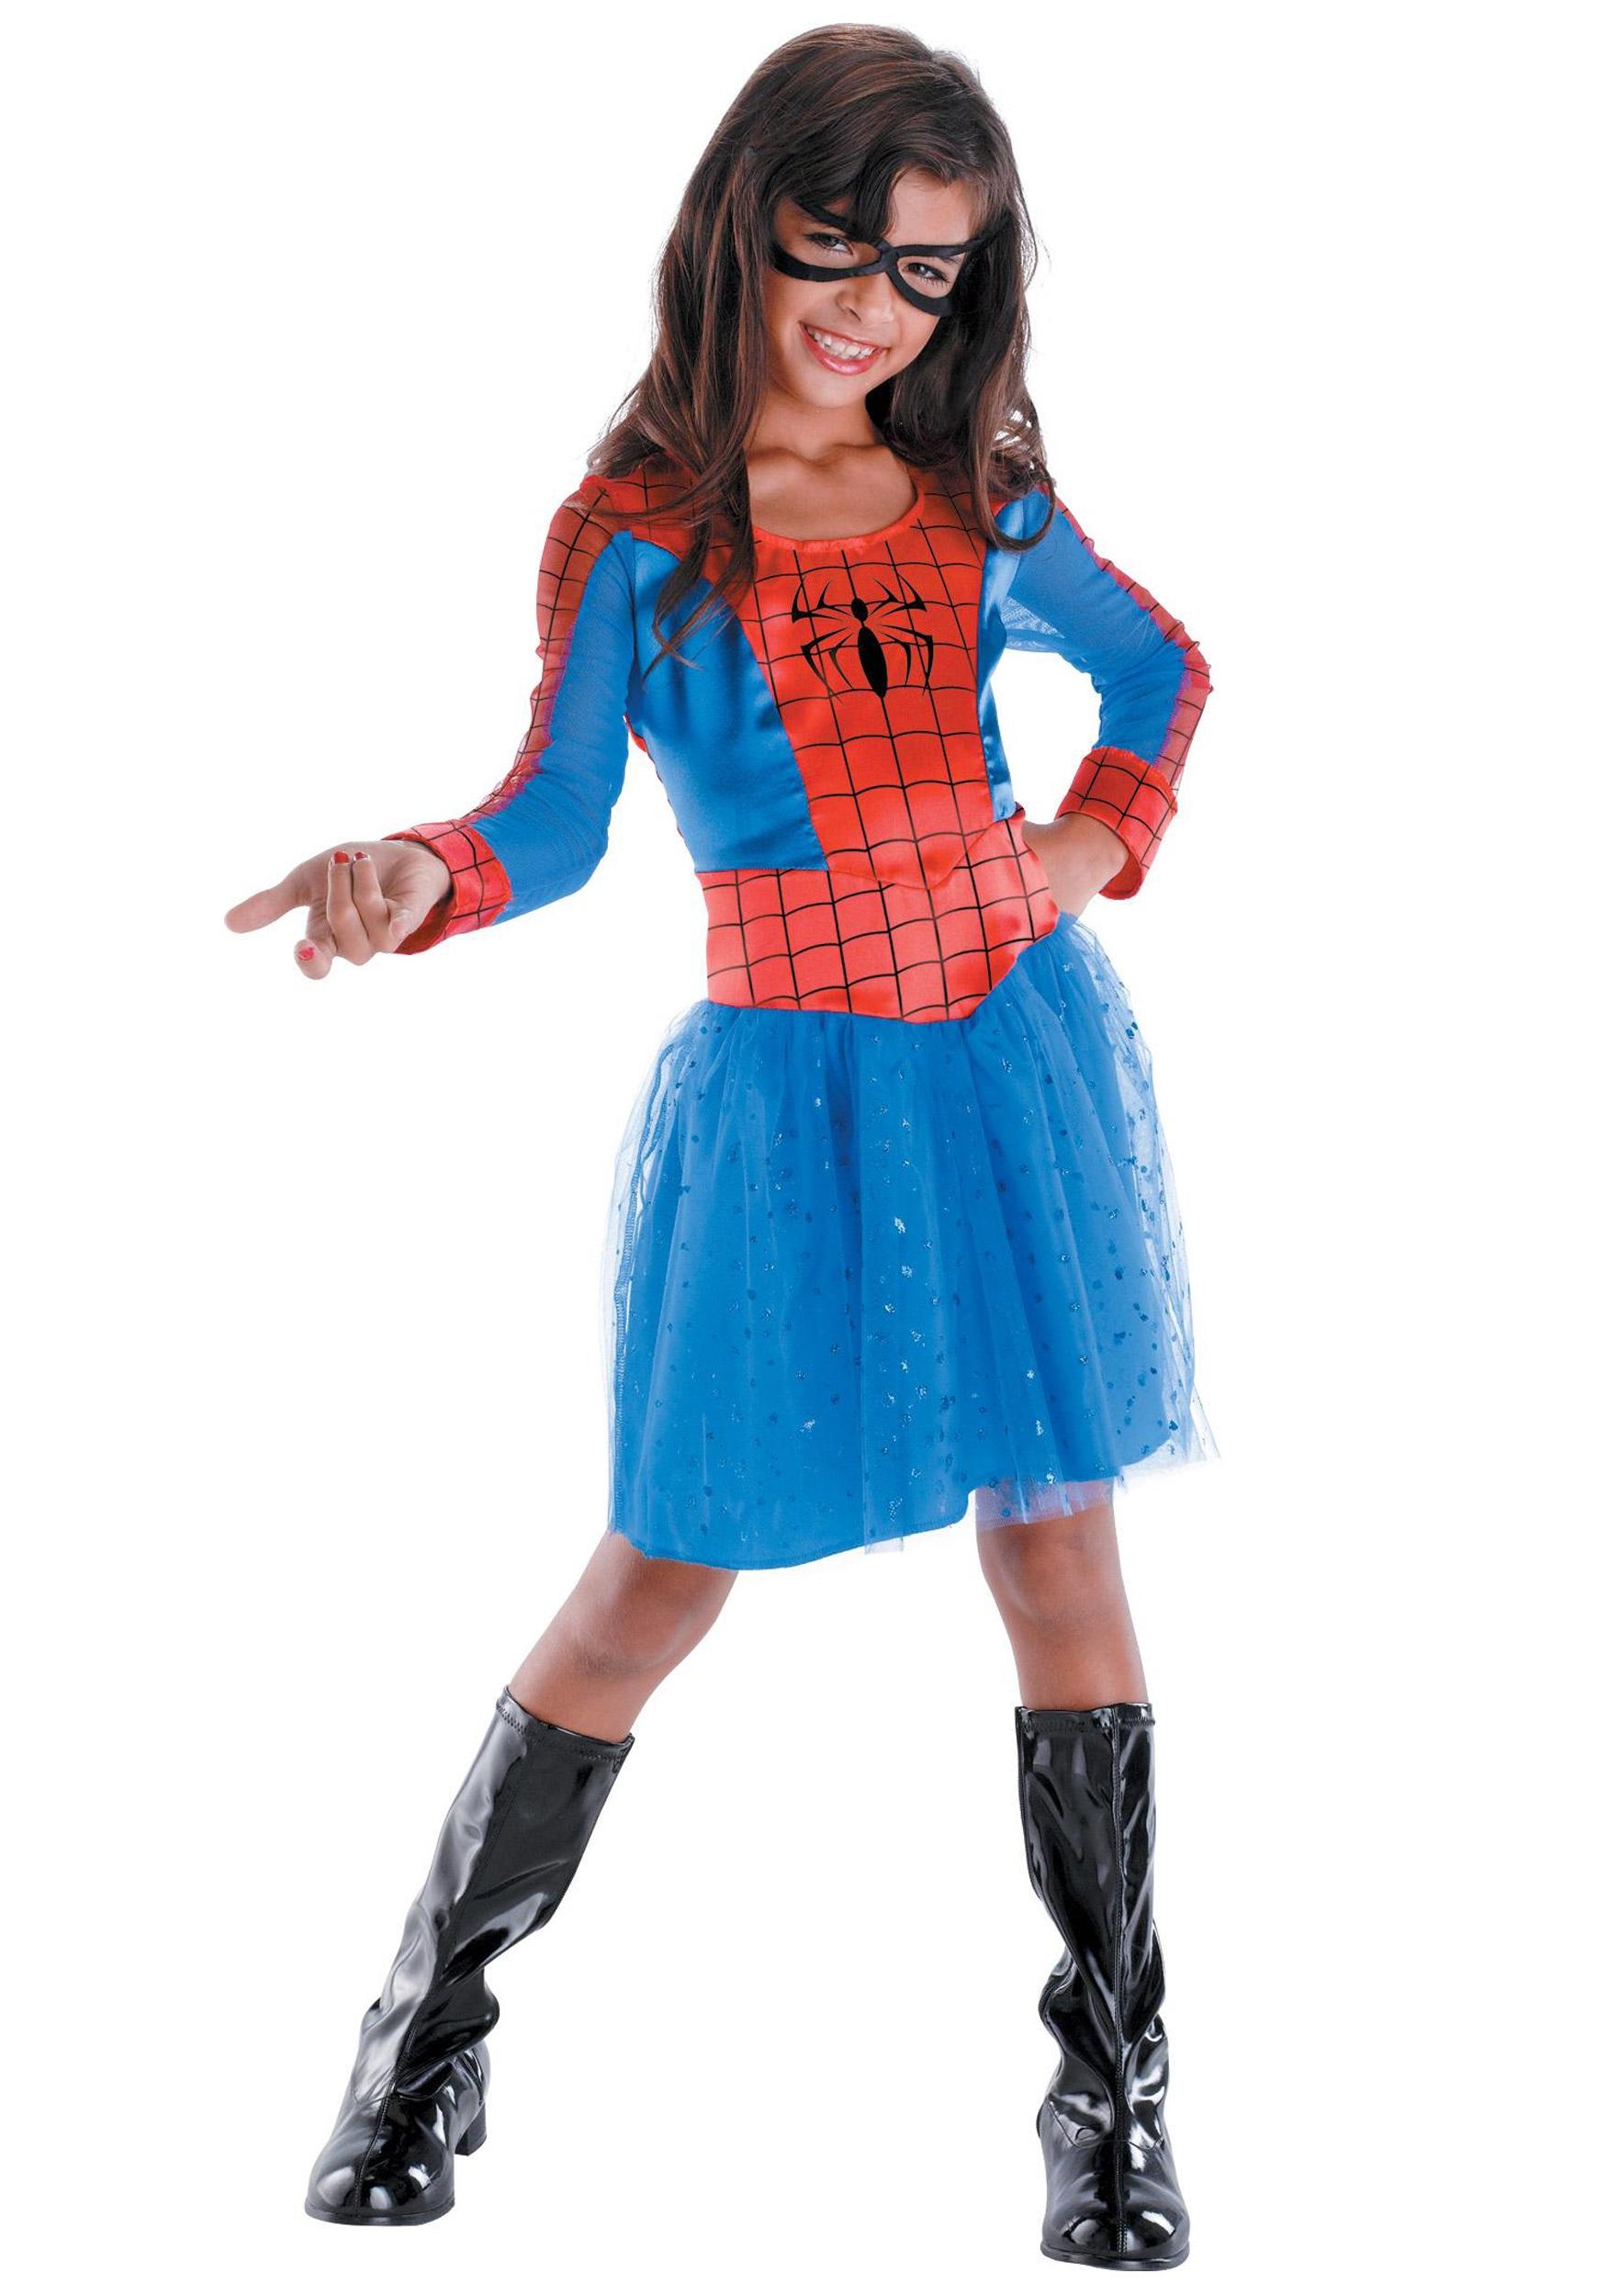 Kids Spider Girl Costume  sc 1 st  Halloween Costumes & Kids Spider Girl Costume - Halloween Costumes